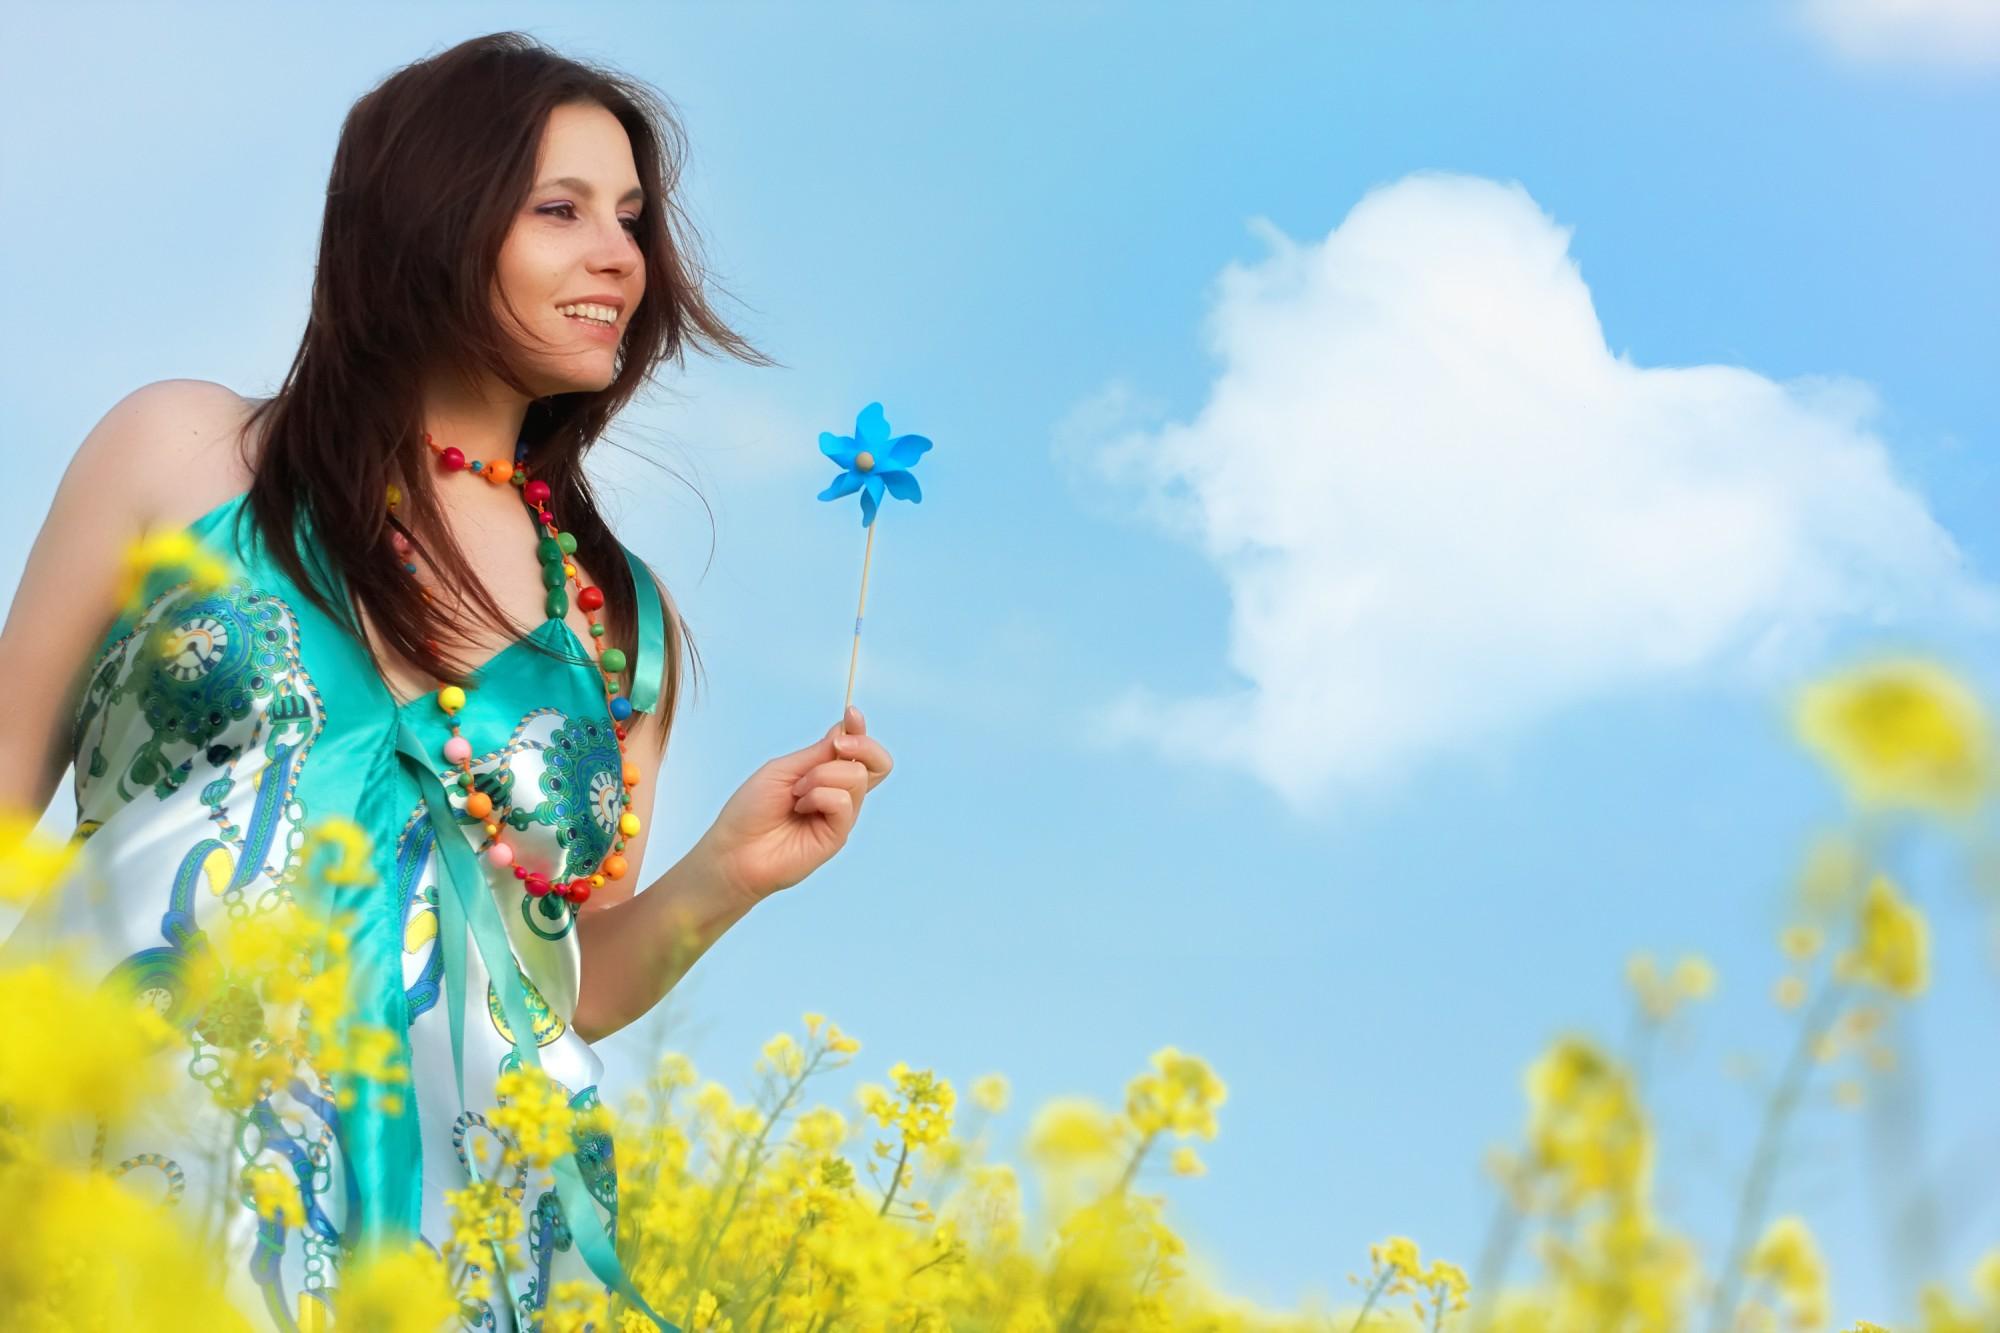 bigstock-beautiful-young-happy-woman-on-31779230-e1425338651520